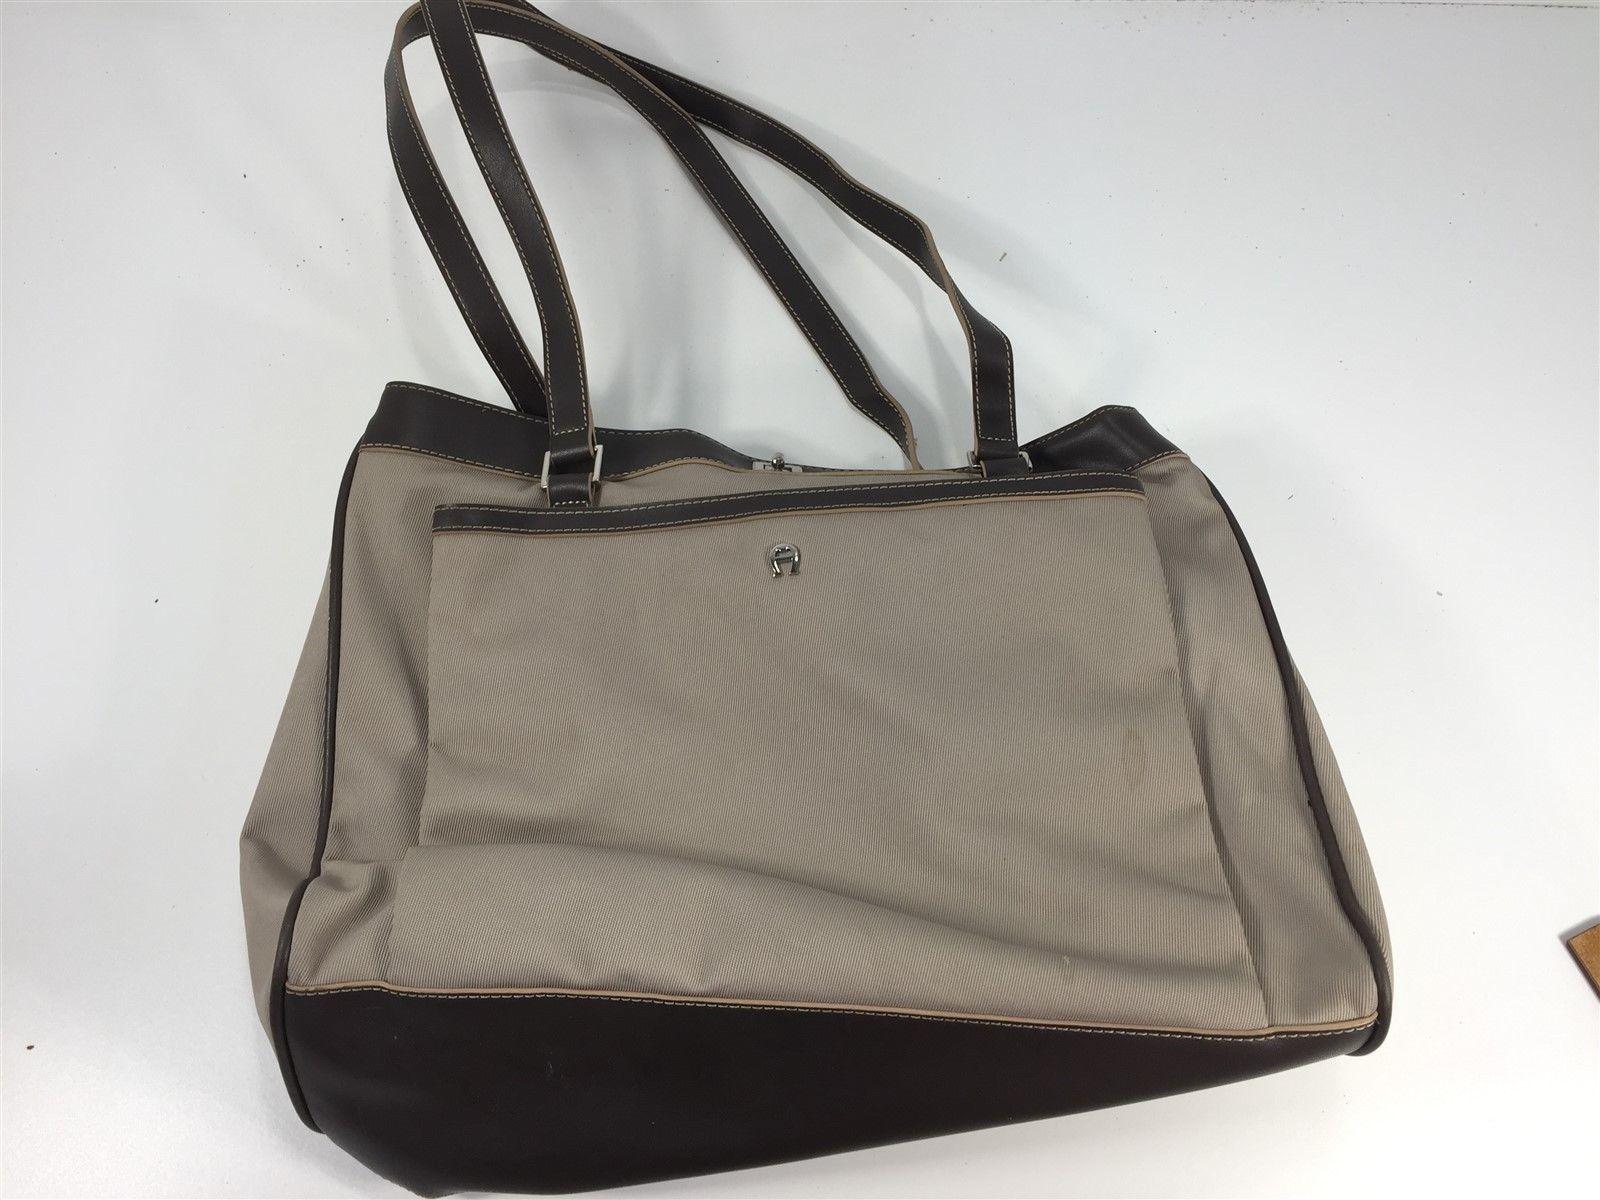 Etienne Aigner Brown Tan Women's Shoulder Handbag Purse - $49.99